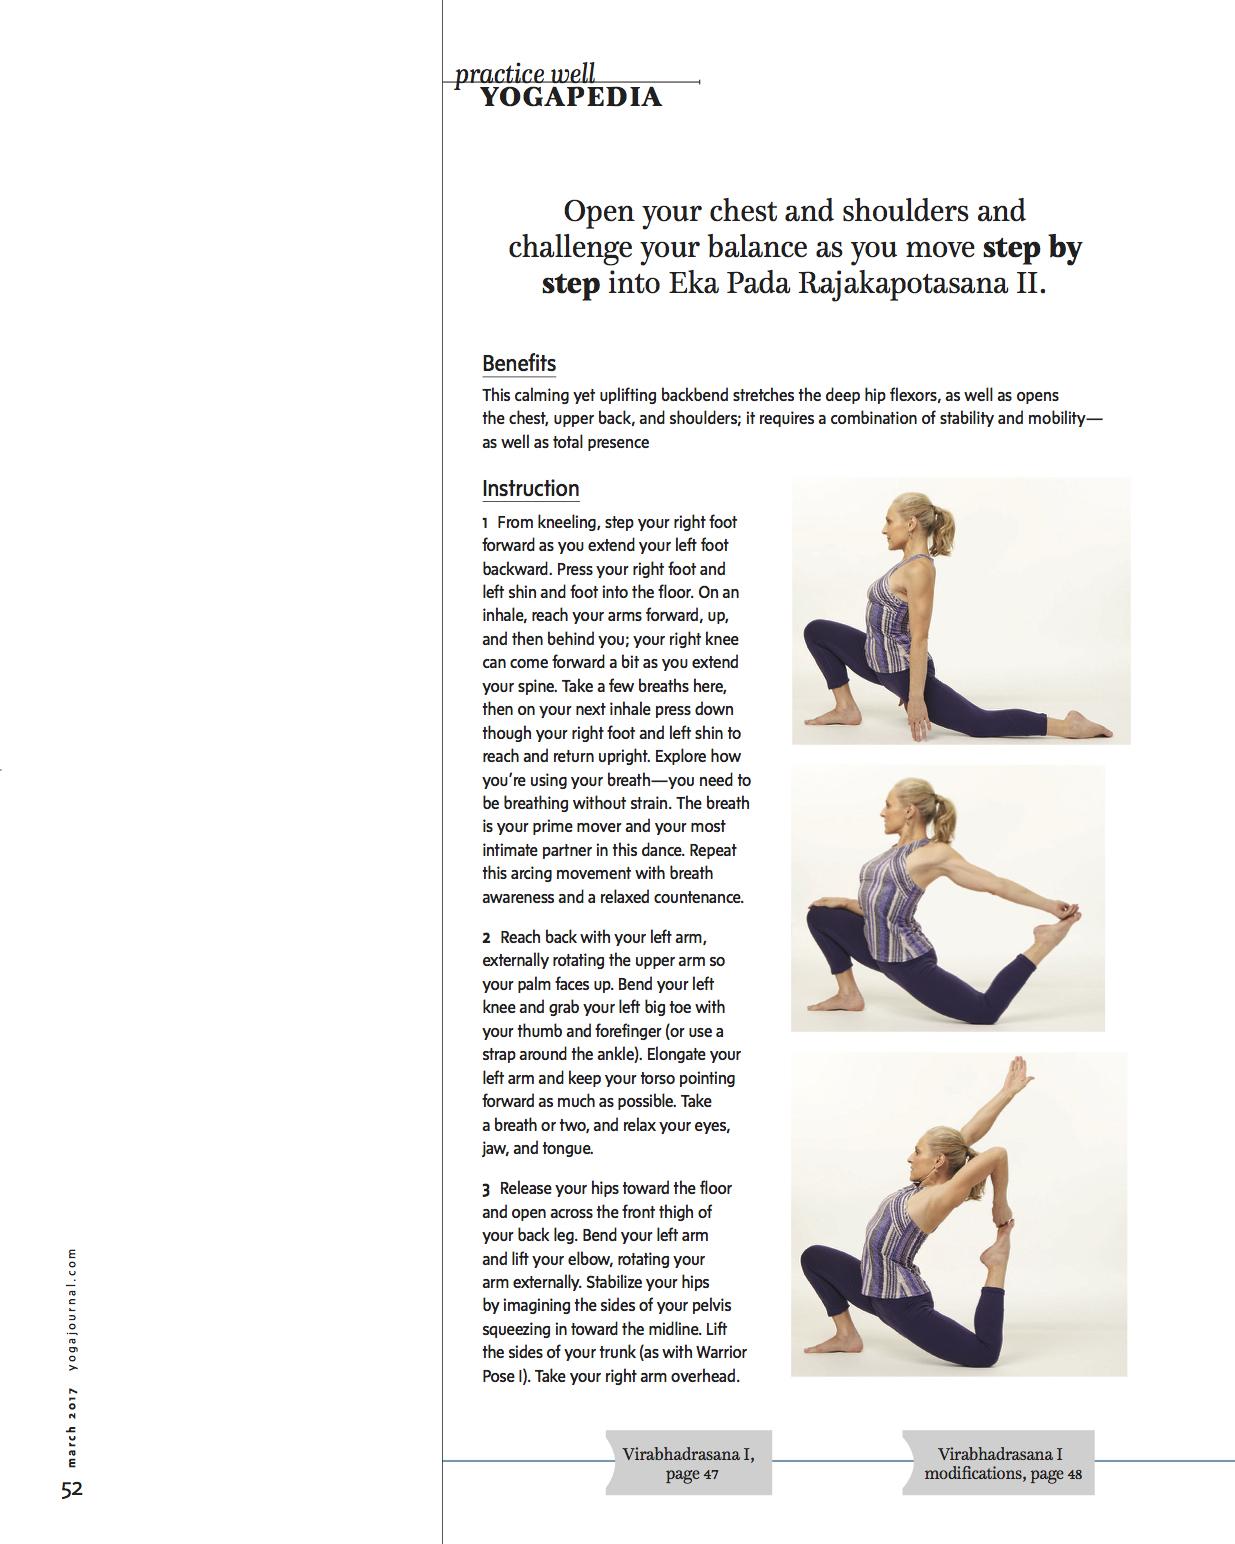 March Yogapedia page 5.jpg